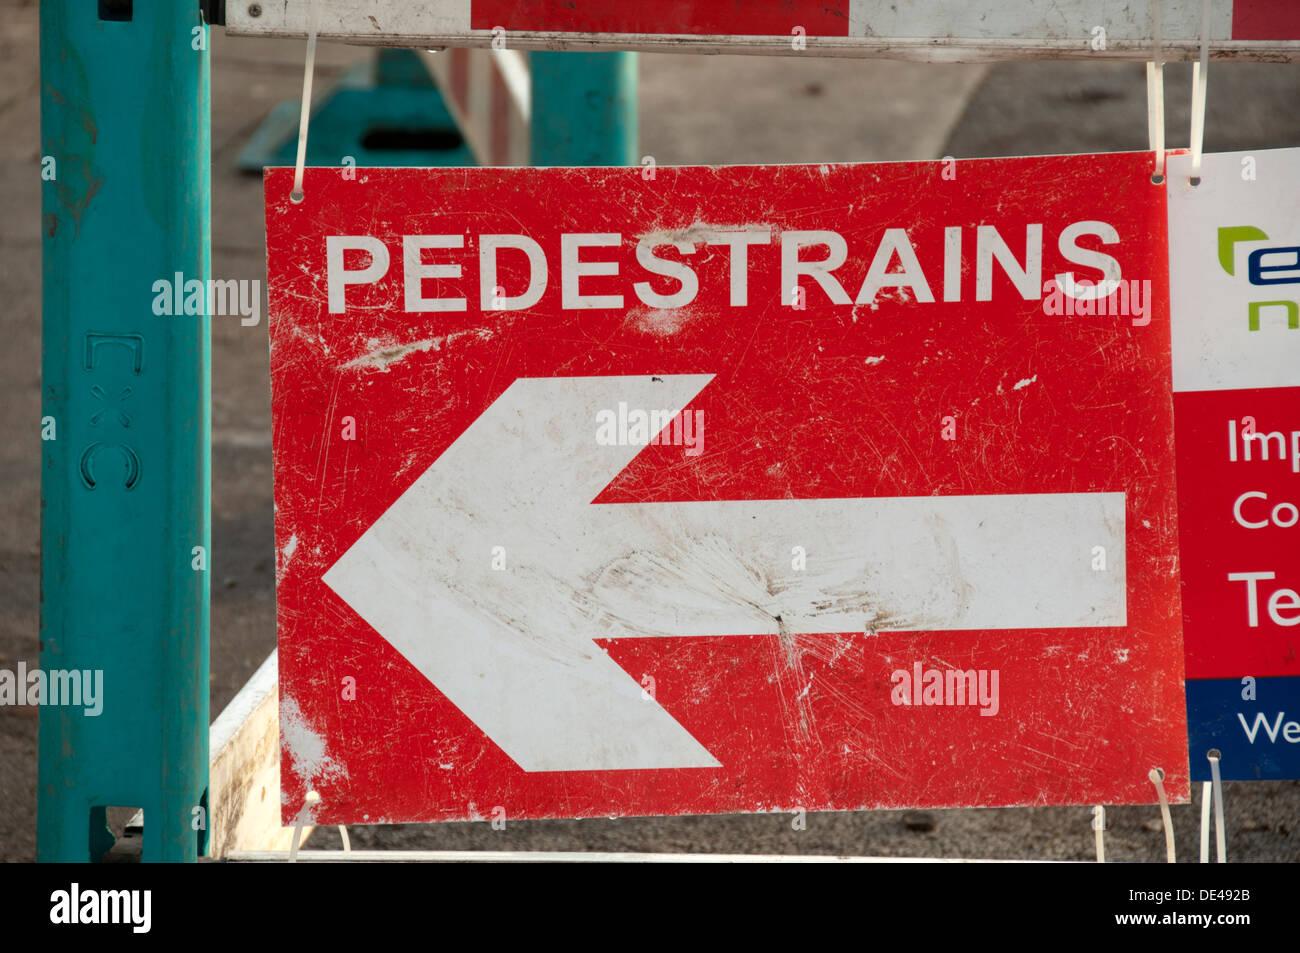 Incorrect spelling on a direction sign for pedestrians, spelt 'pedestrains'.  Droylsden, Manchester, England, UK Stock Photo